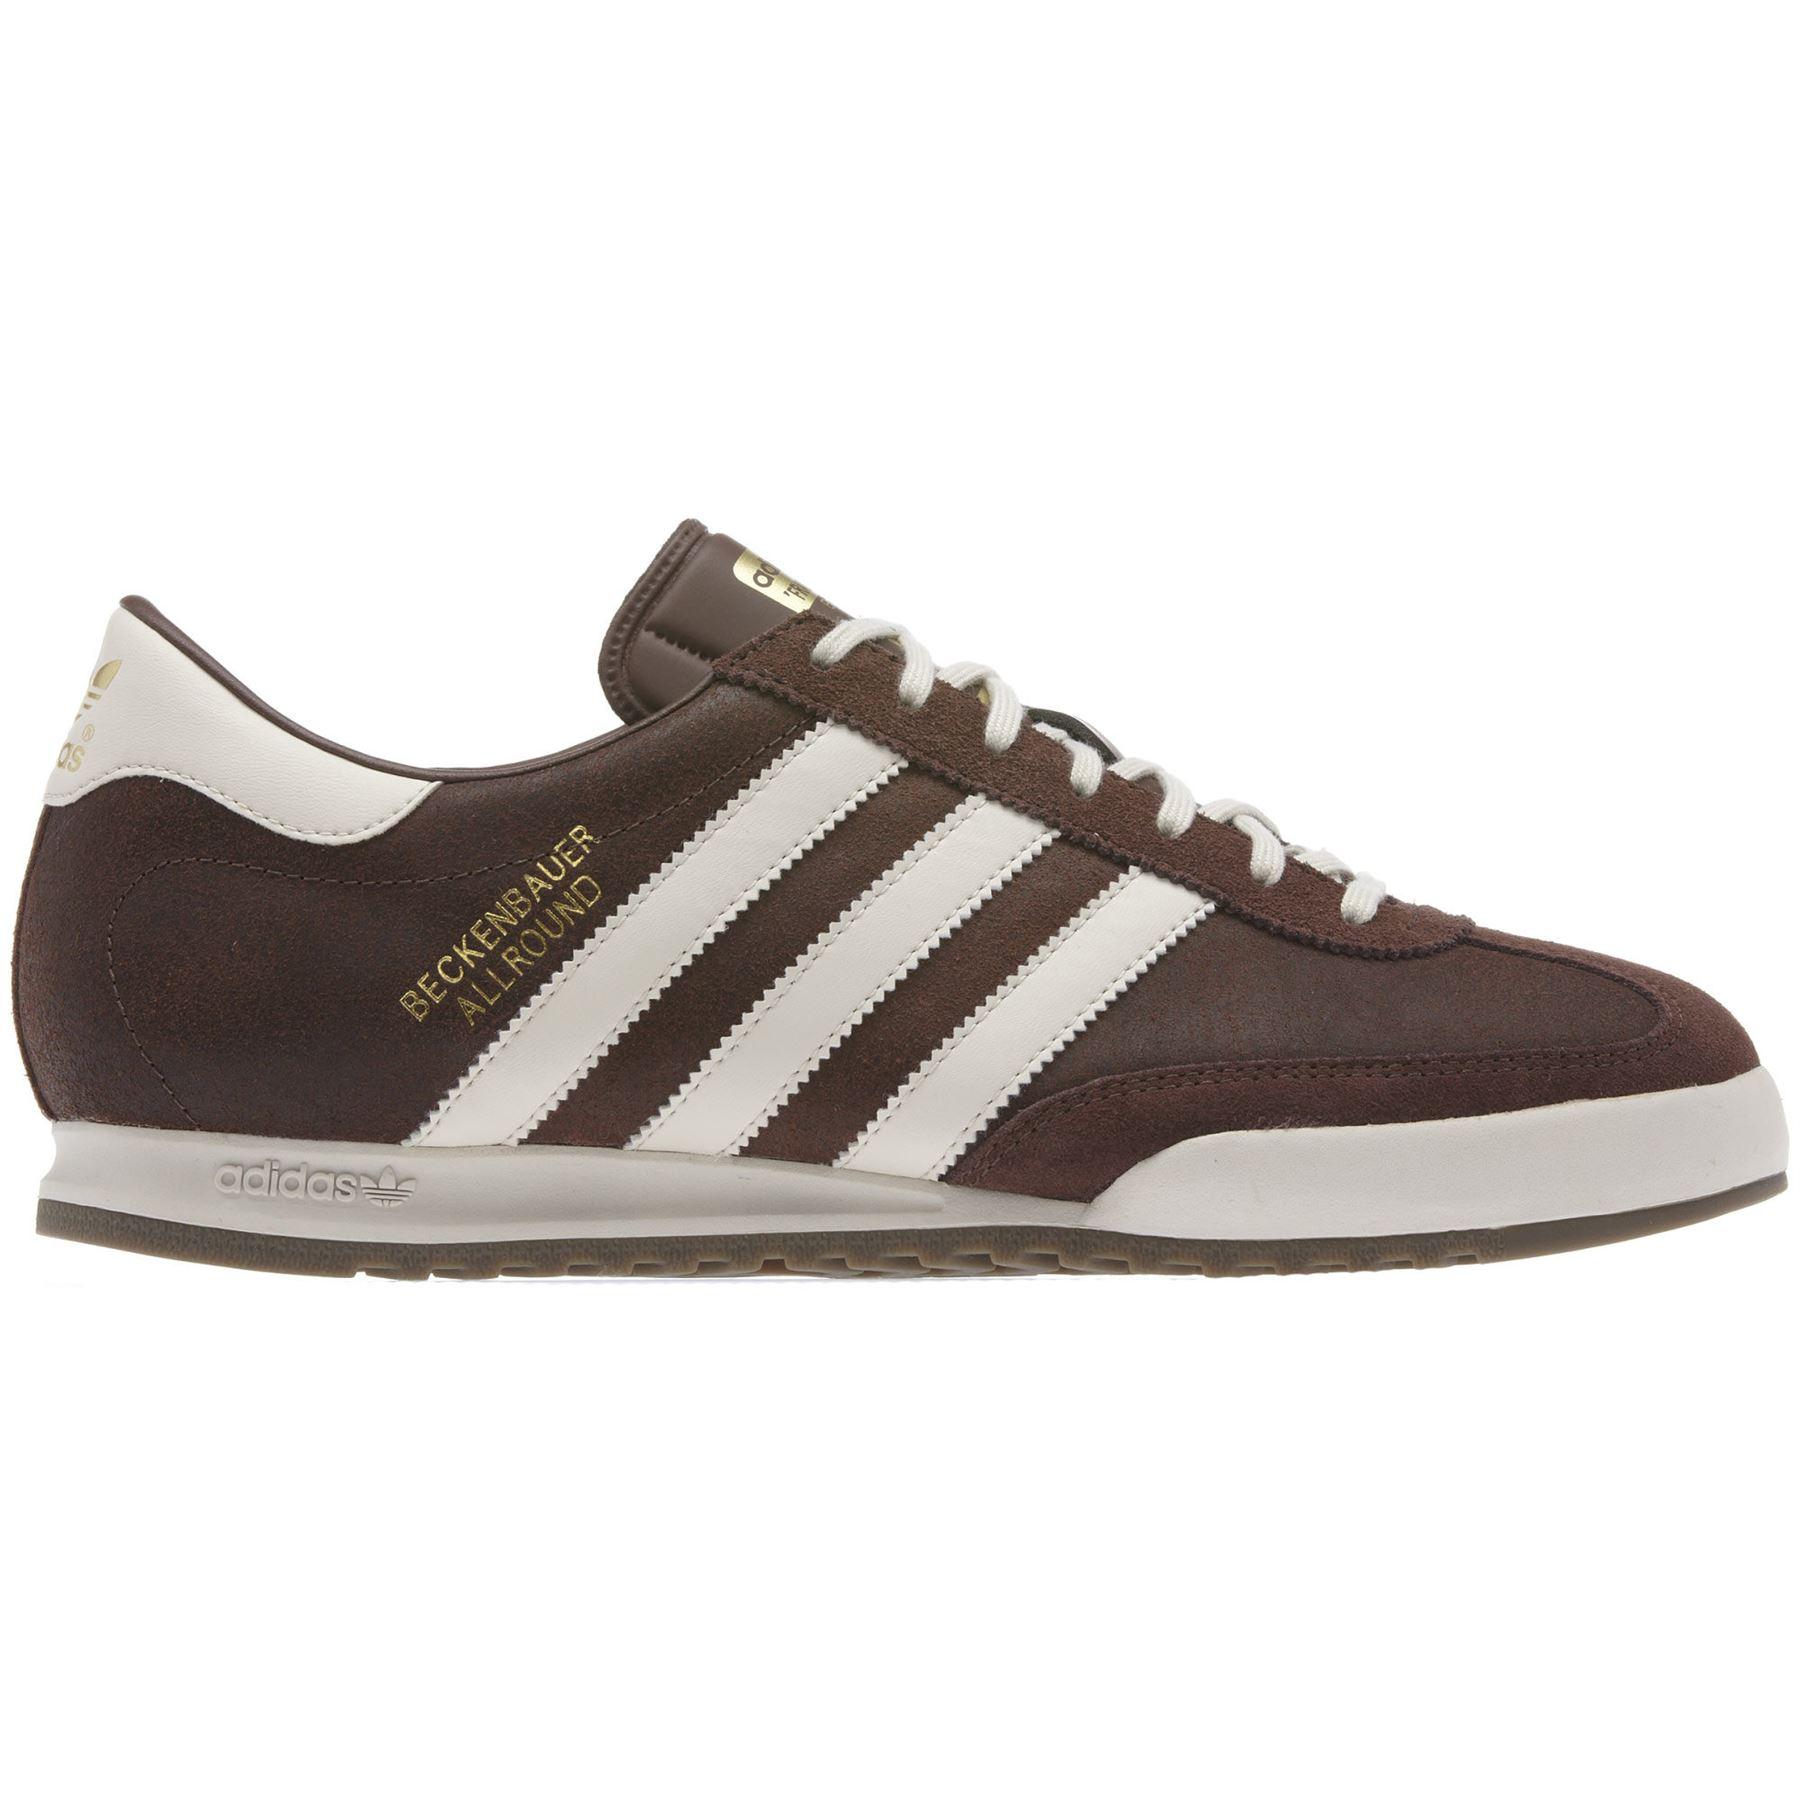 adidas classic shoes adidas-originals-trainers-multi-listings-shoes-beckenbauer-stan- KZZFJUW